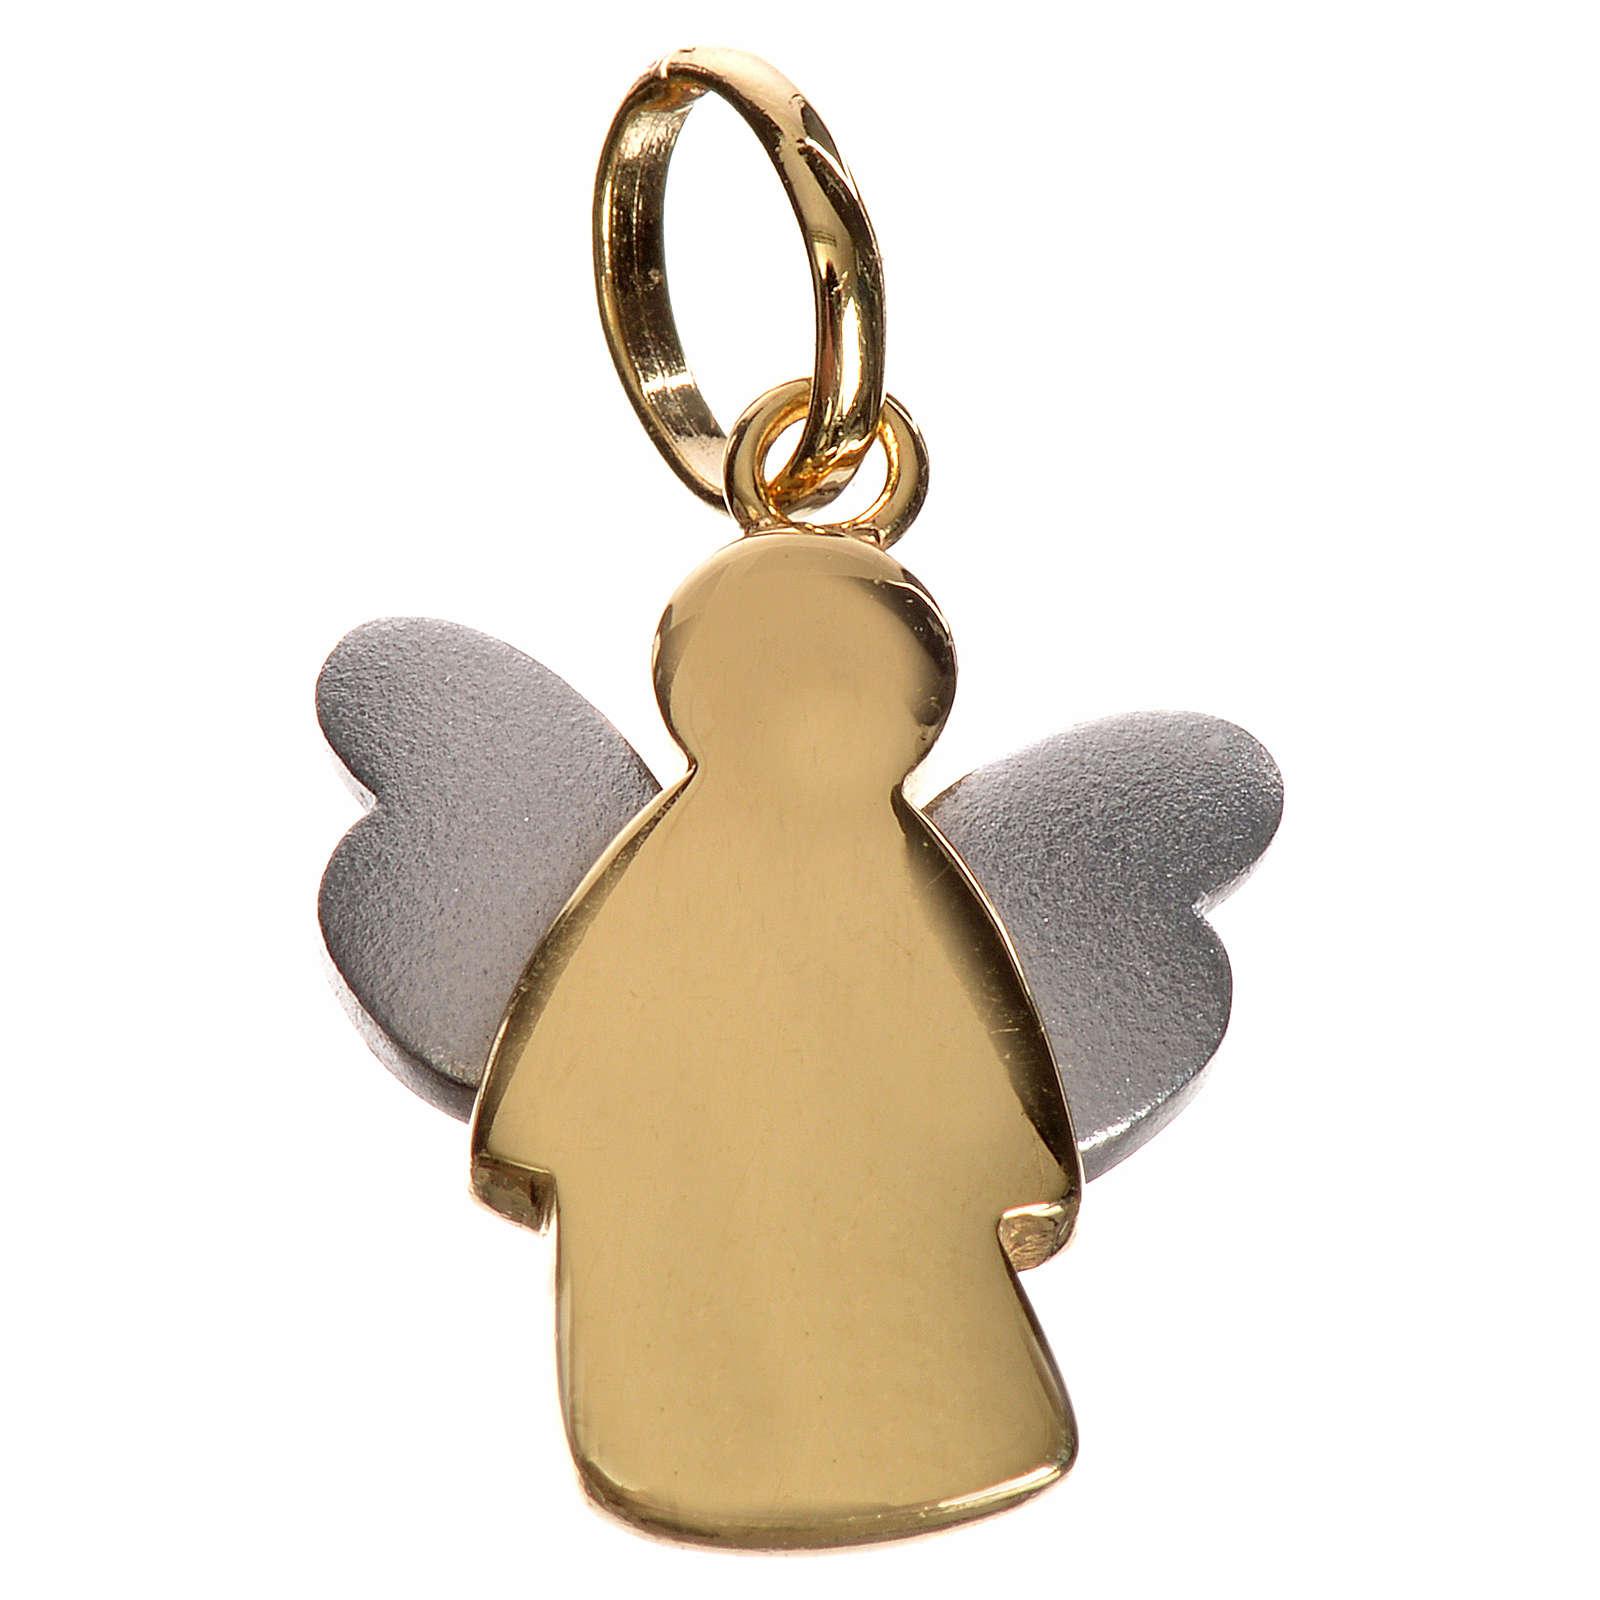 Ange pendentif en or - 1,98gr 4